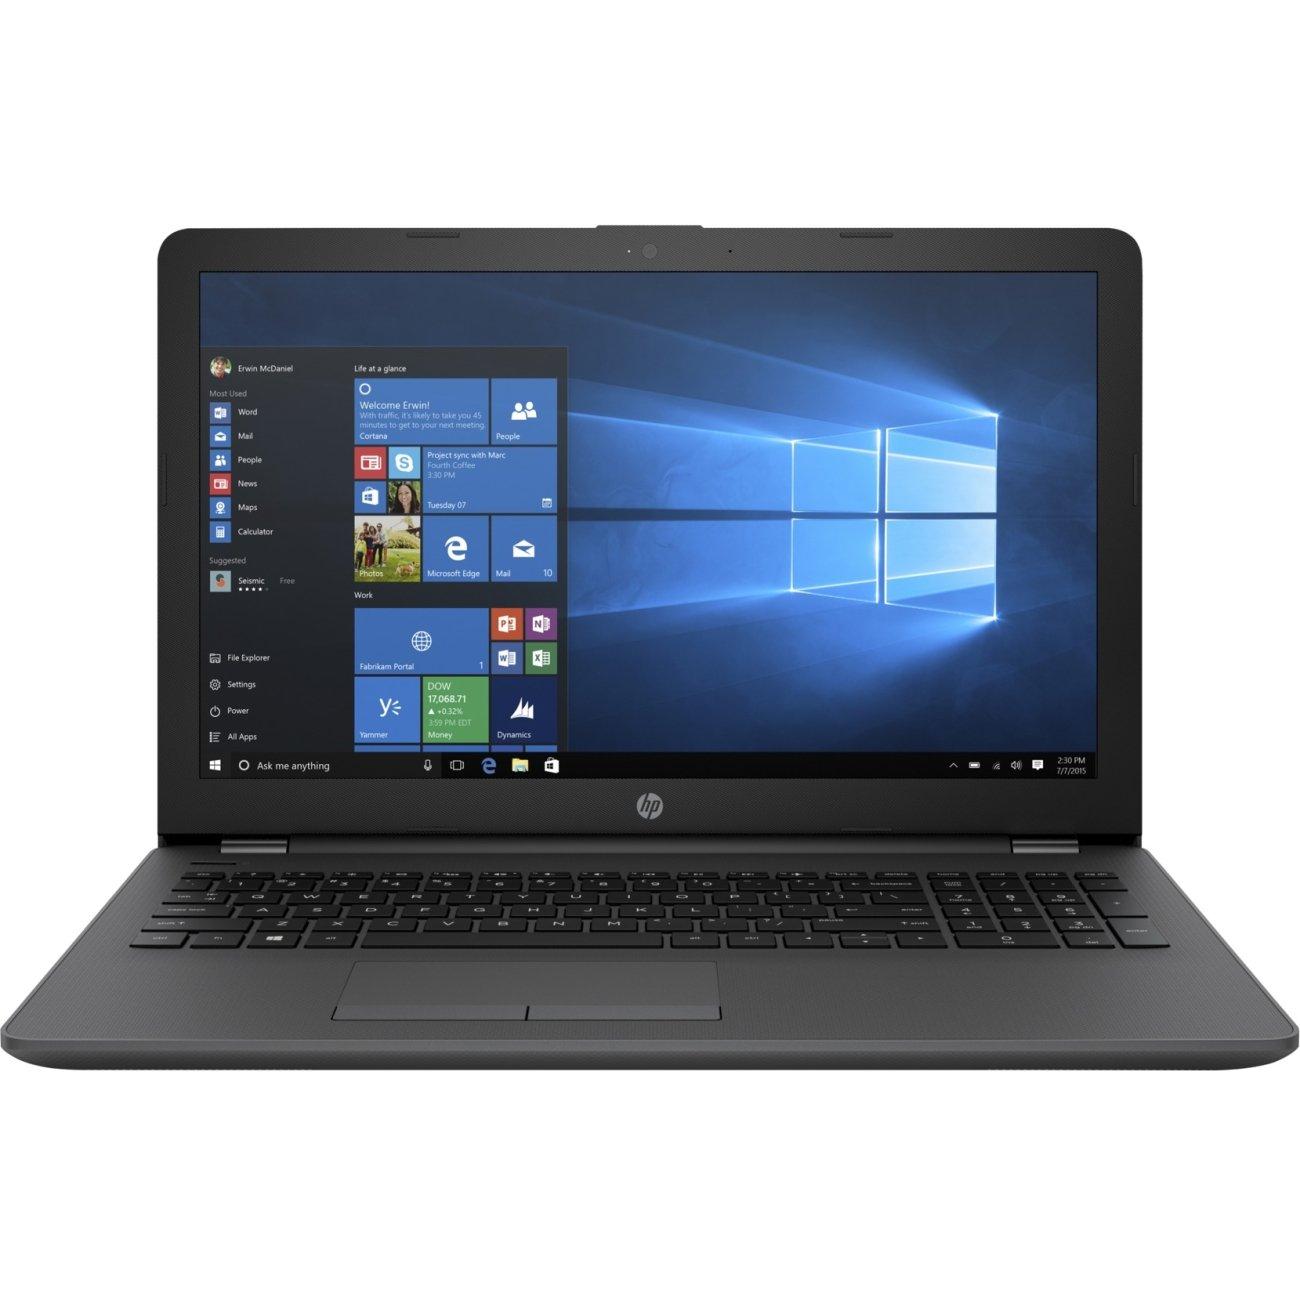 "Amazon.com: HP 255 G6 15.6"" LCD Notebook - AMD E-Series - 4 GB - 500 GB HDD  - Windows 10 Home 64-bit (English) (1LB15UT): Computers & Accessories"